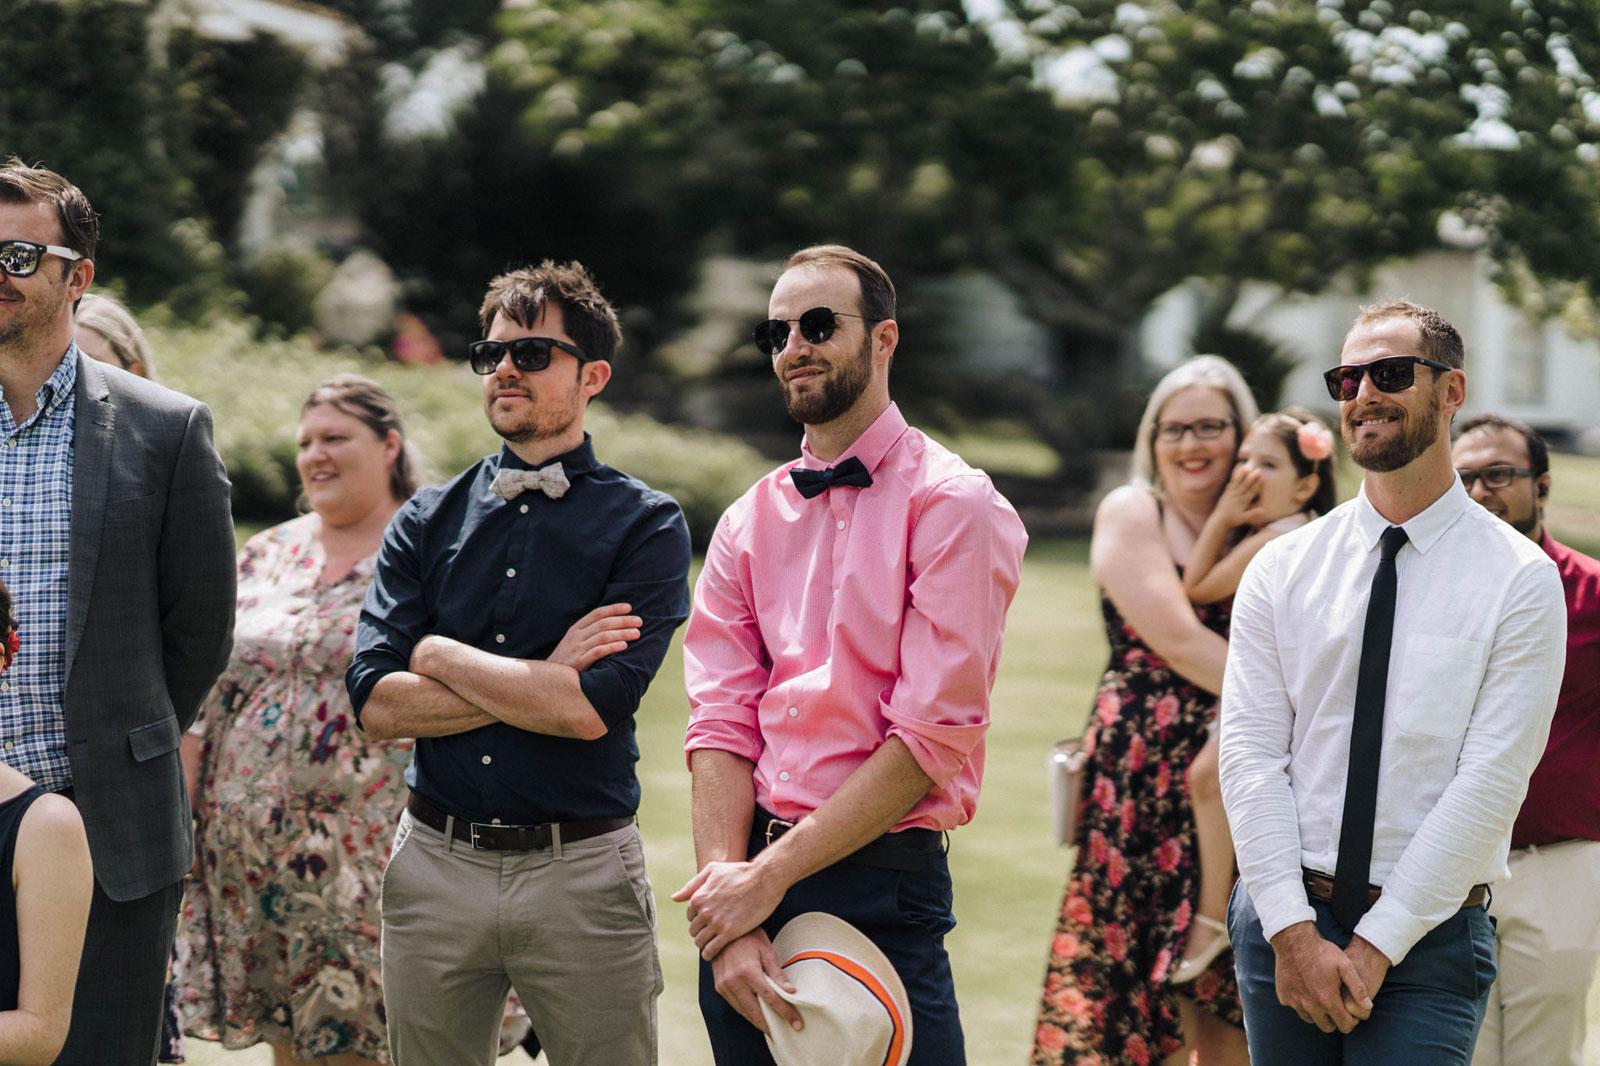 newfound-n-c-olive-tree-cottage-tauranga-wedding-photographer-446